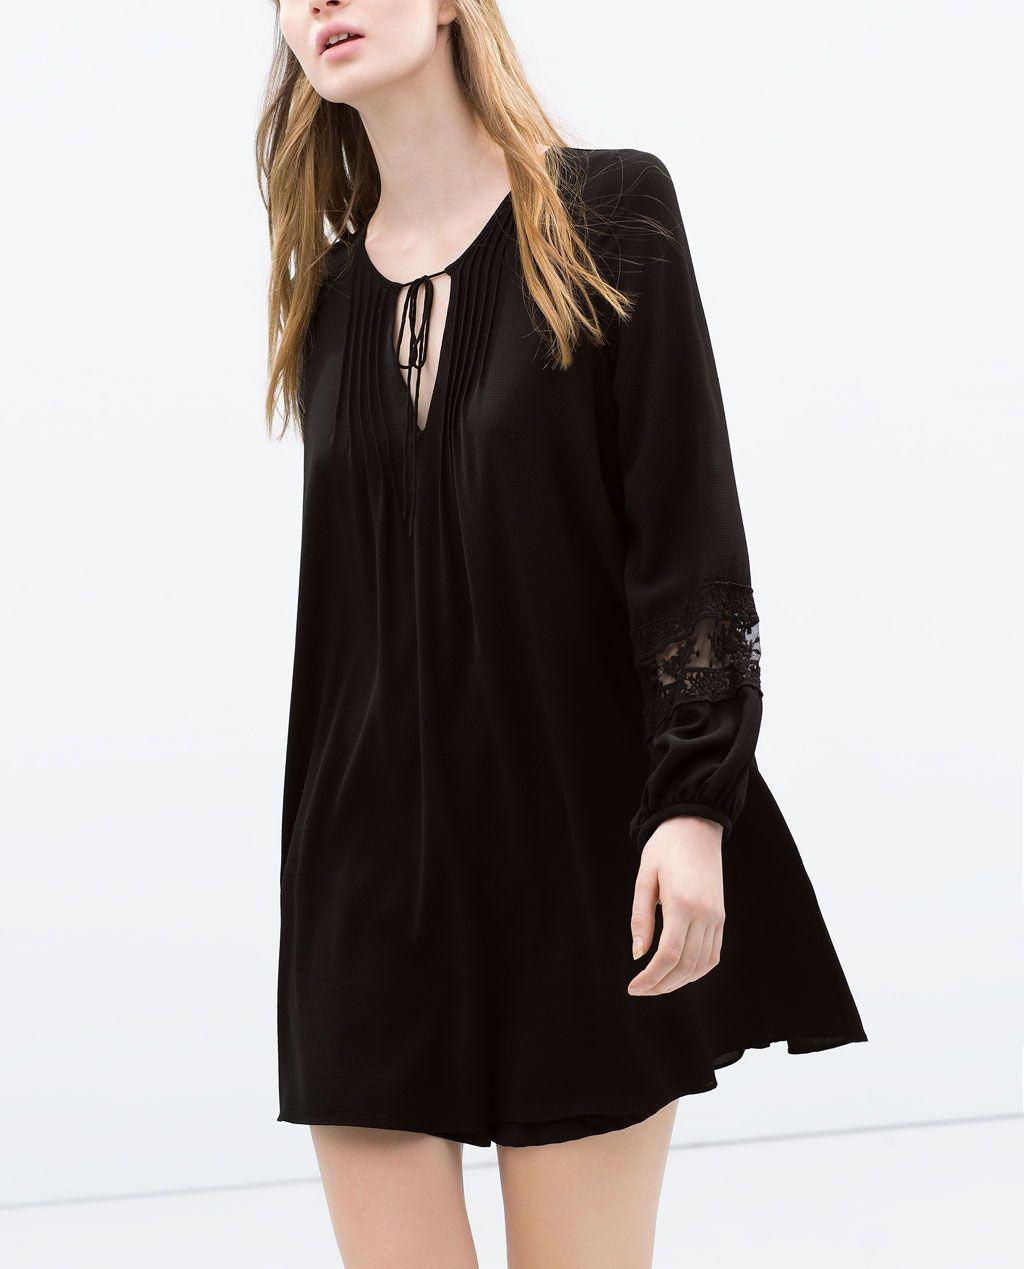 zara - mujer - vestido tÚnica encaje | schwarzes kleid zara